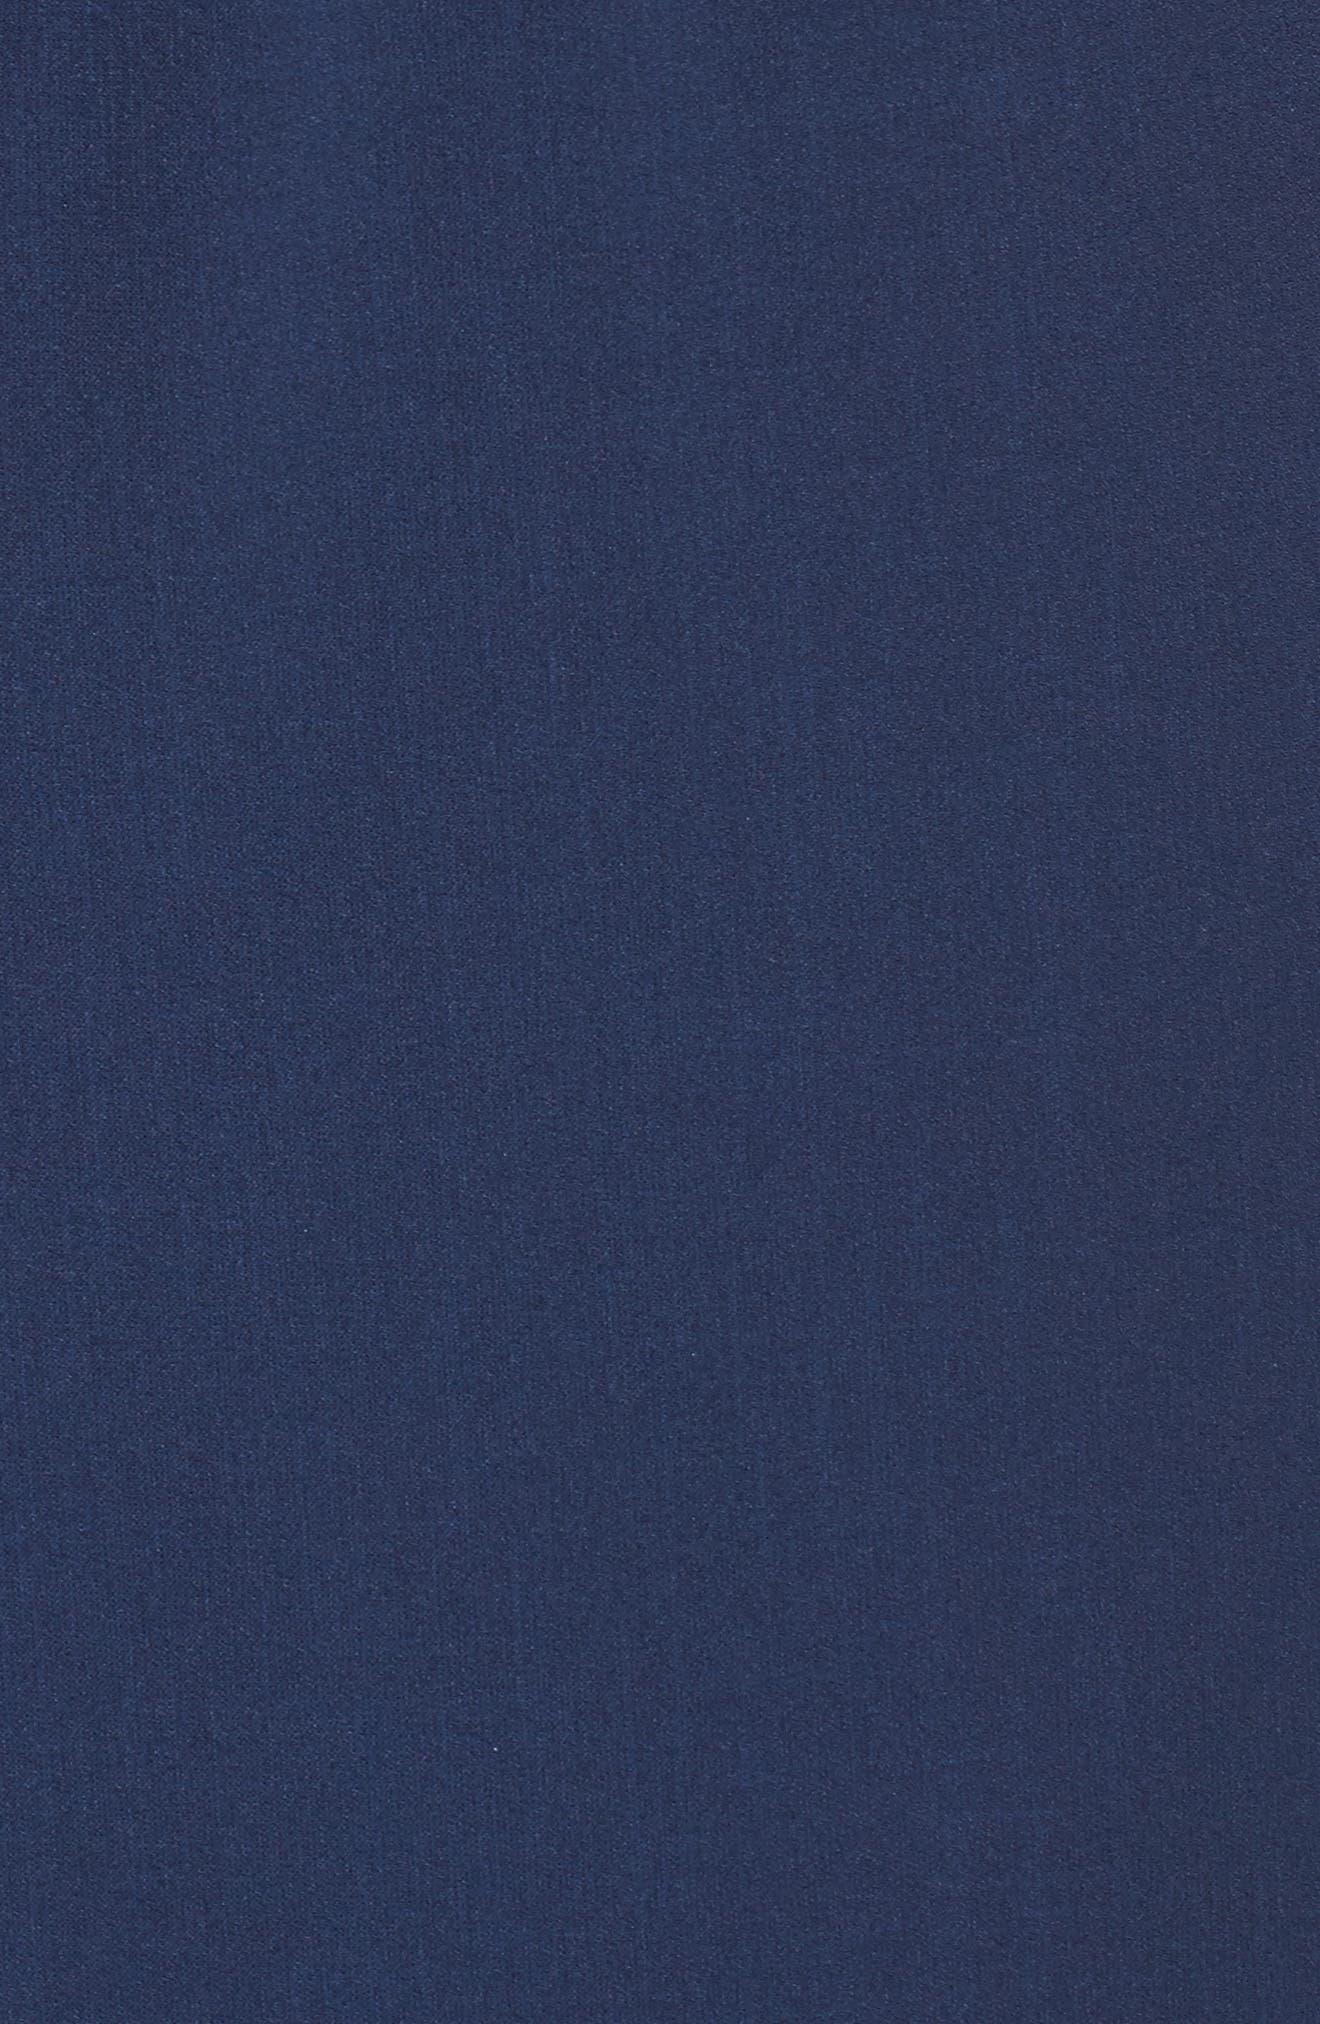 Crepe Sheath Dress,                             Alternate thumbnail 11, color,